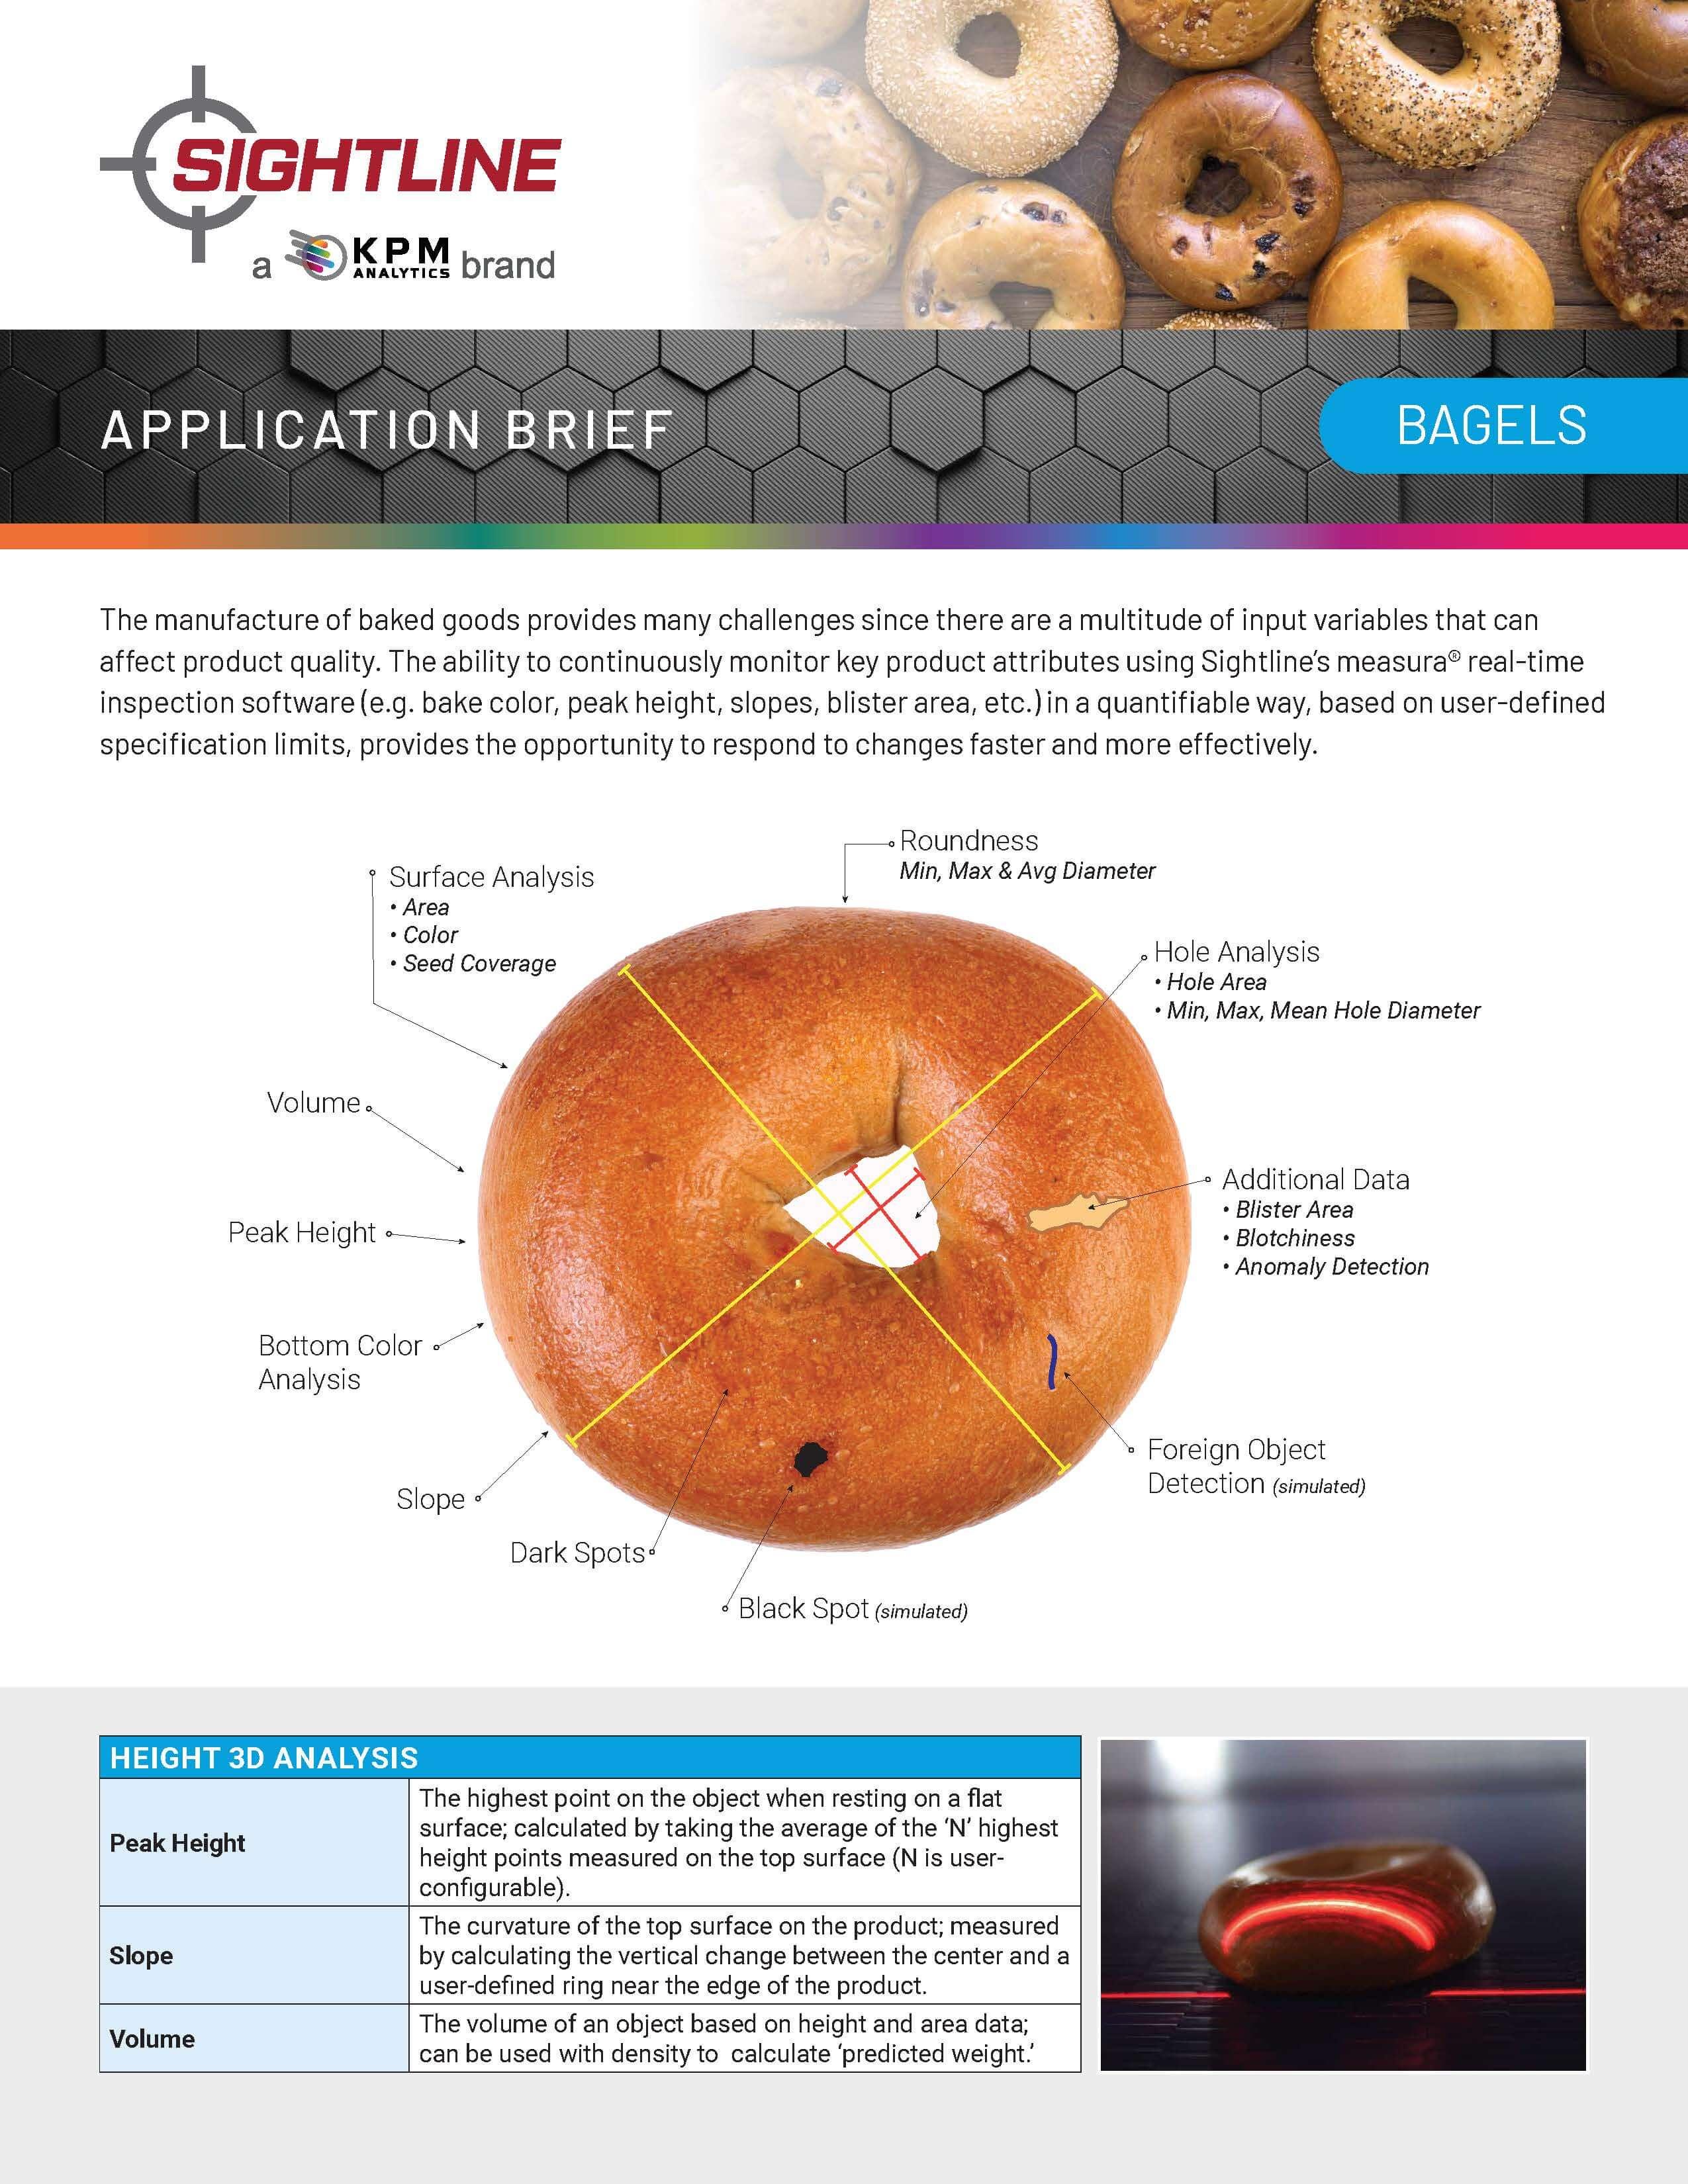 Vision Inspection of Bagels